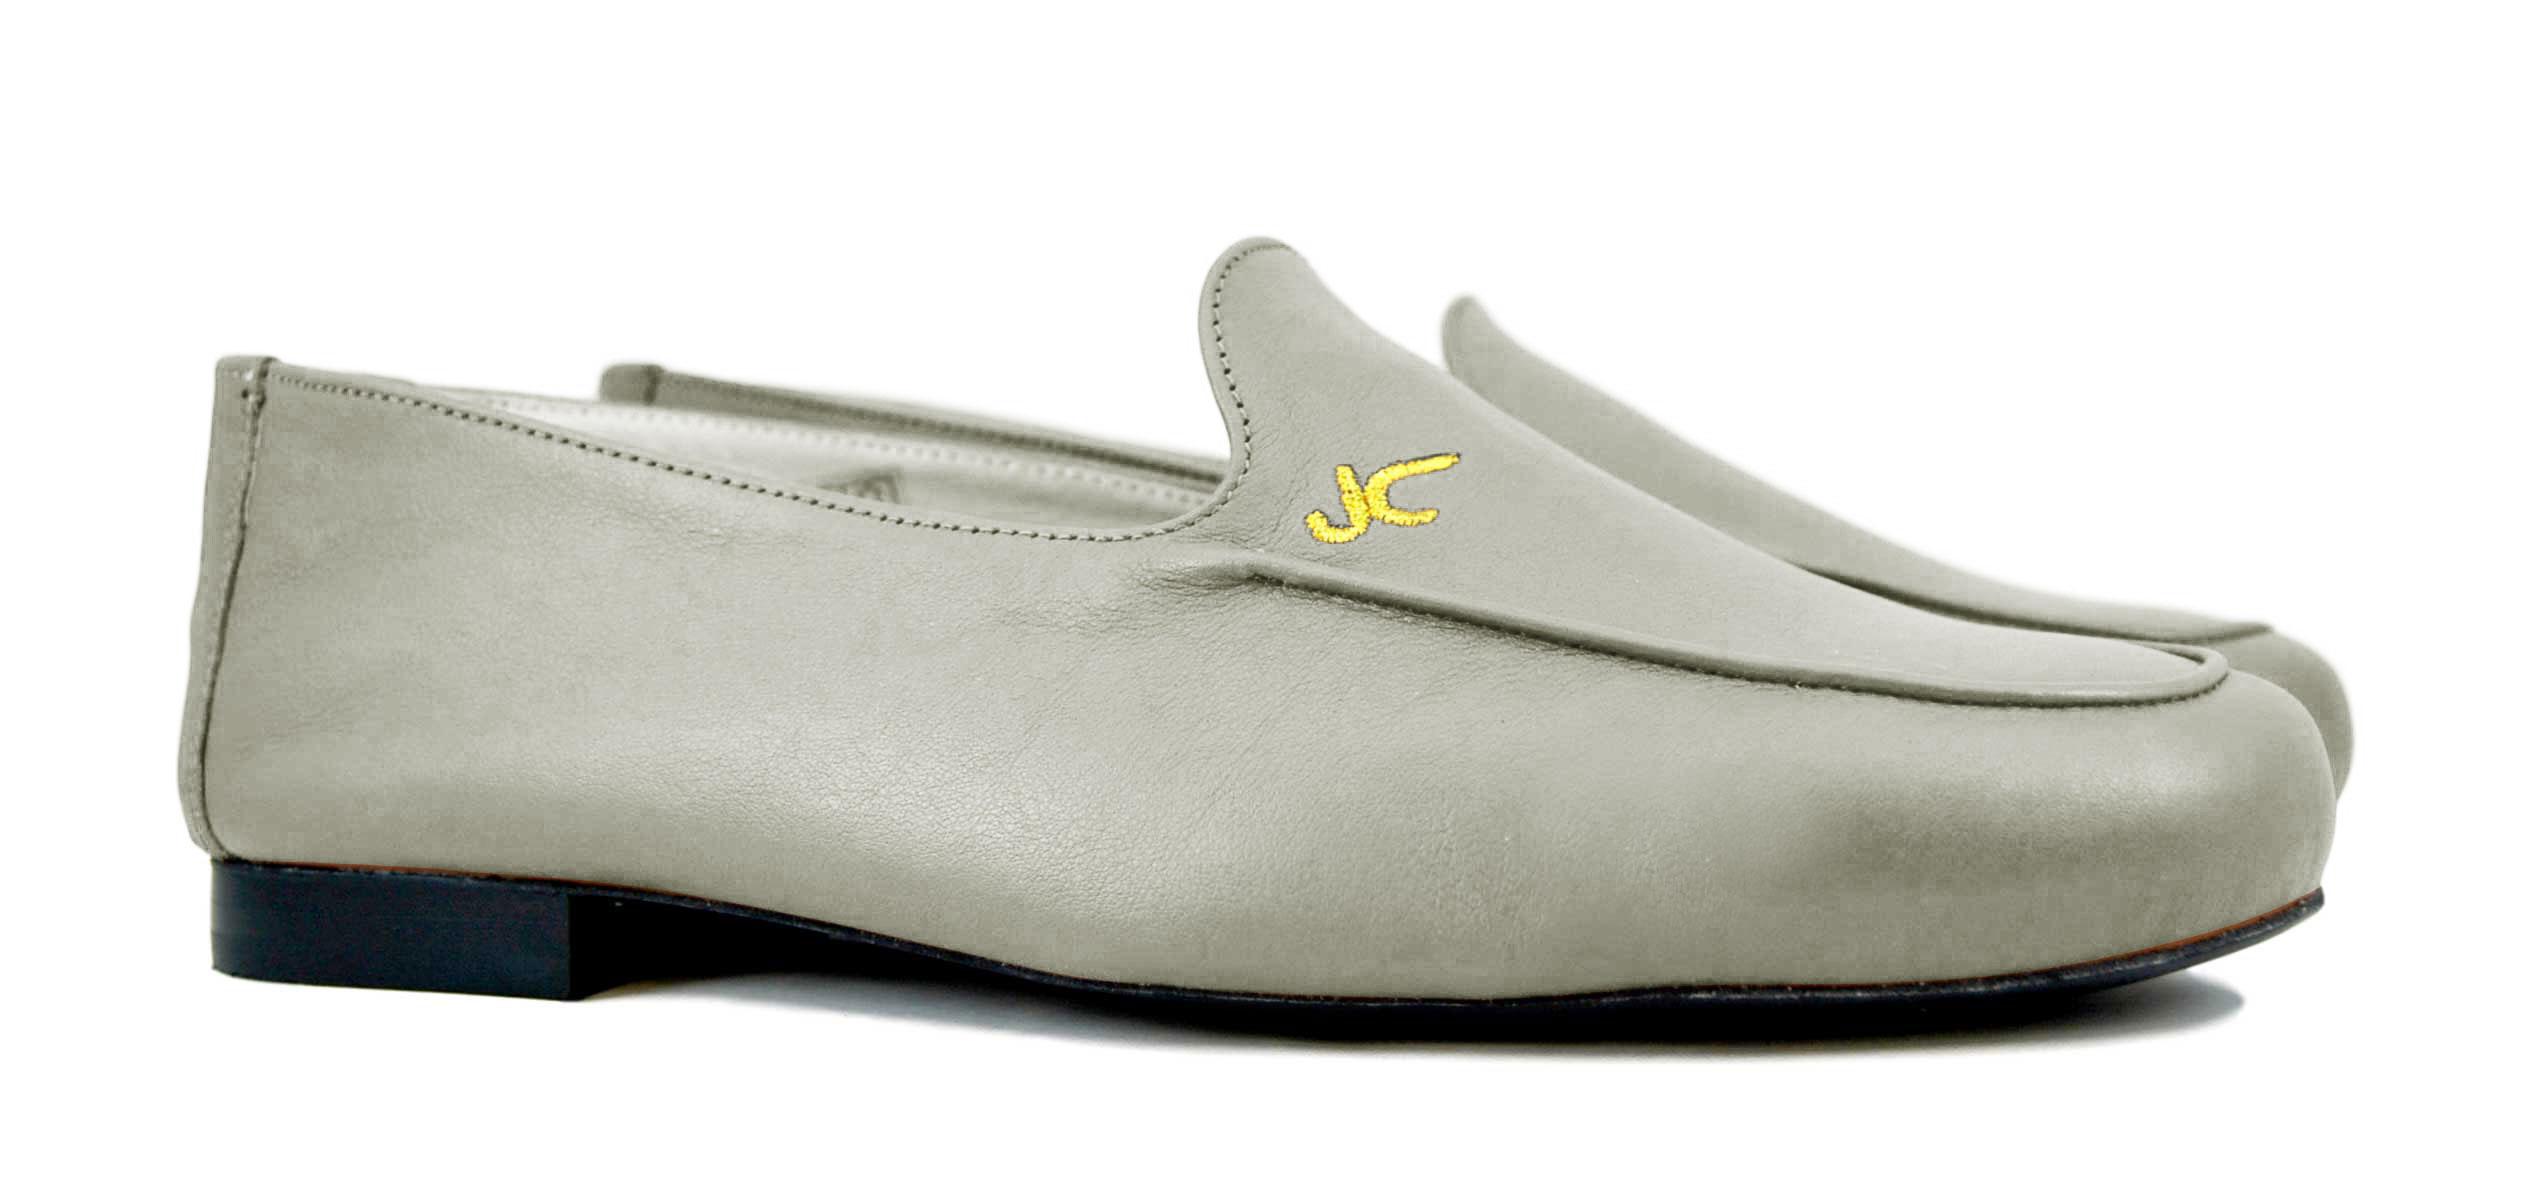 Foto 5 de Zapatos Julio Iglesias 528 JC Perla Napa Mocasin